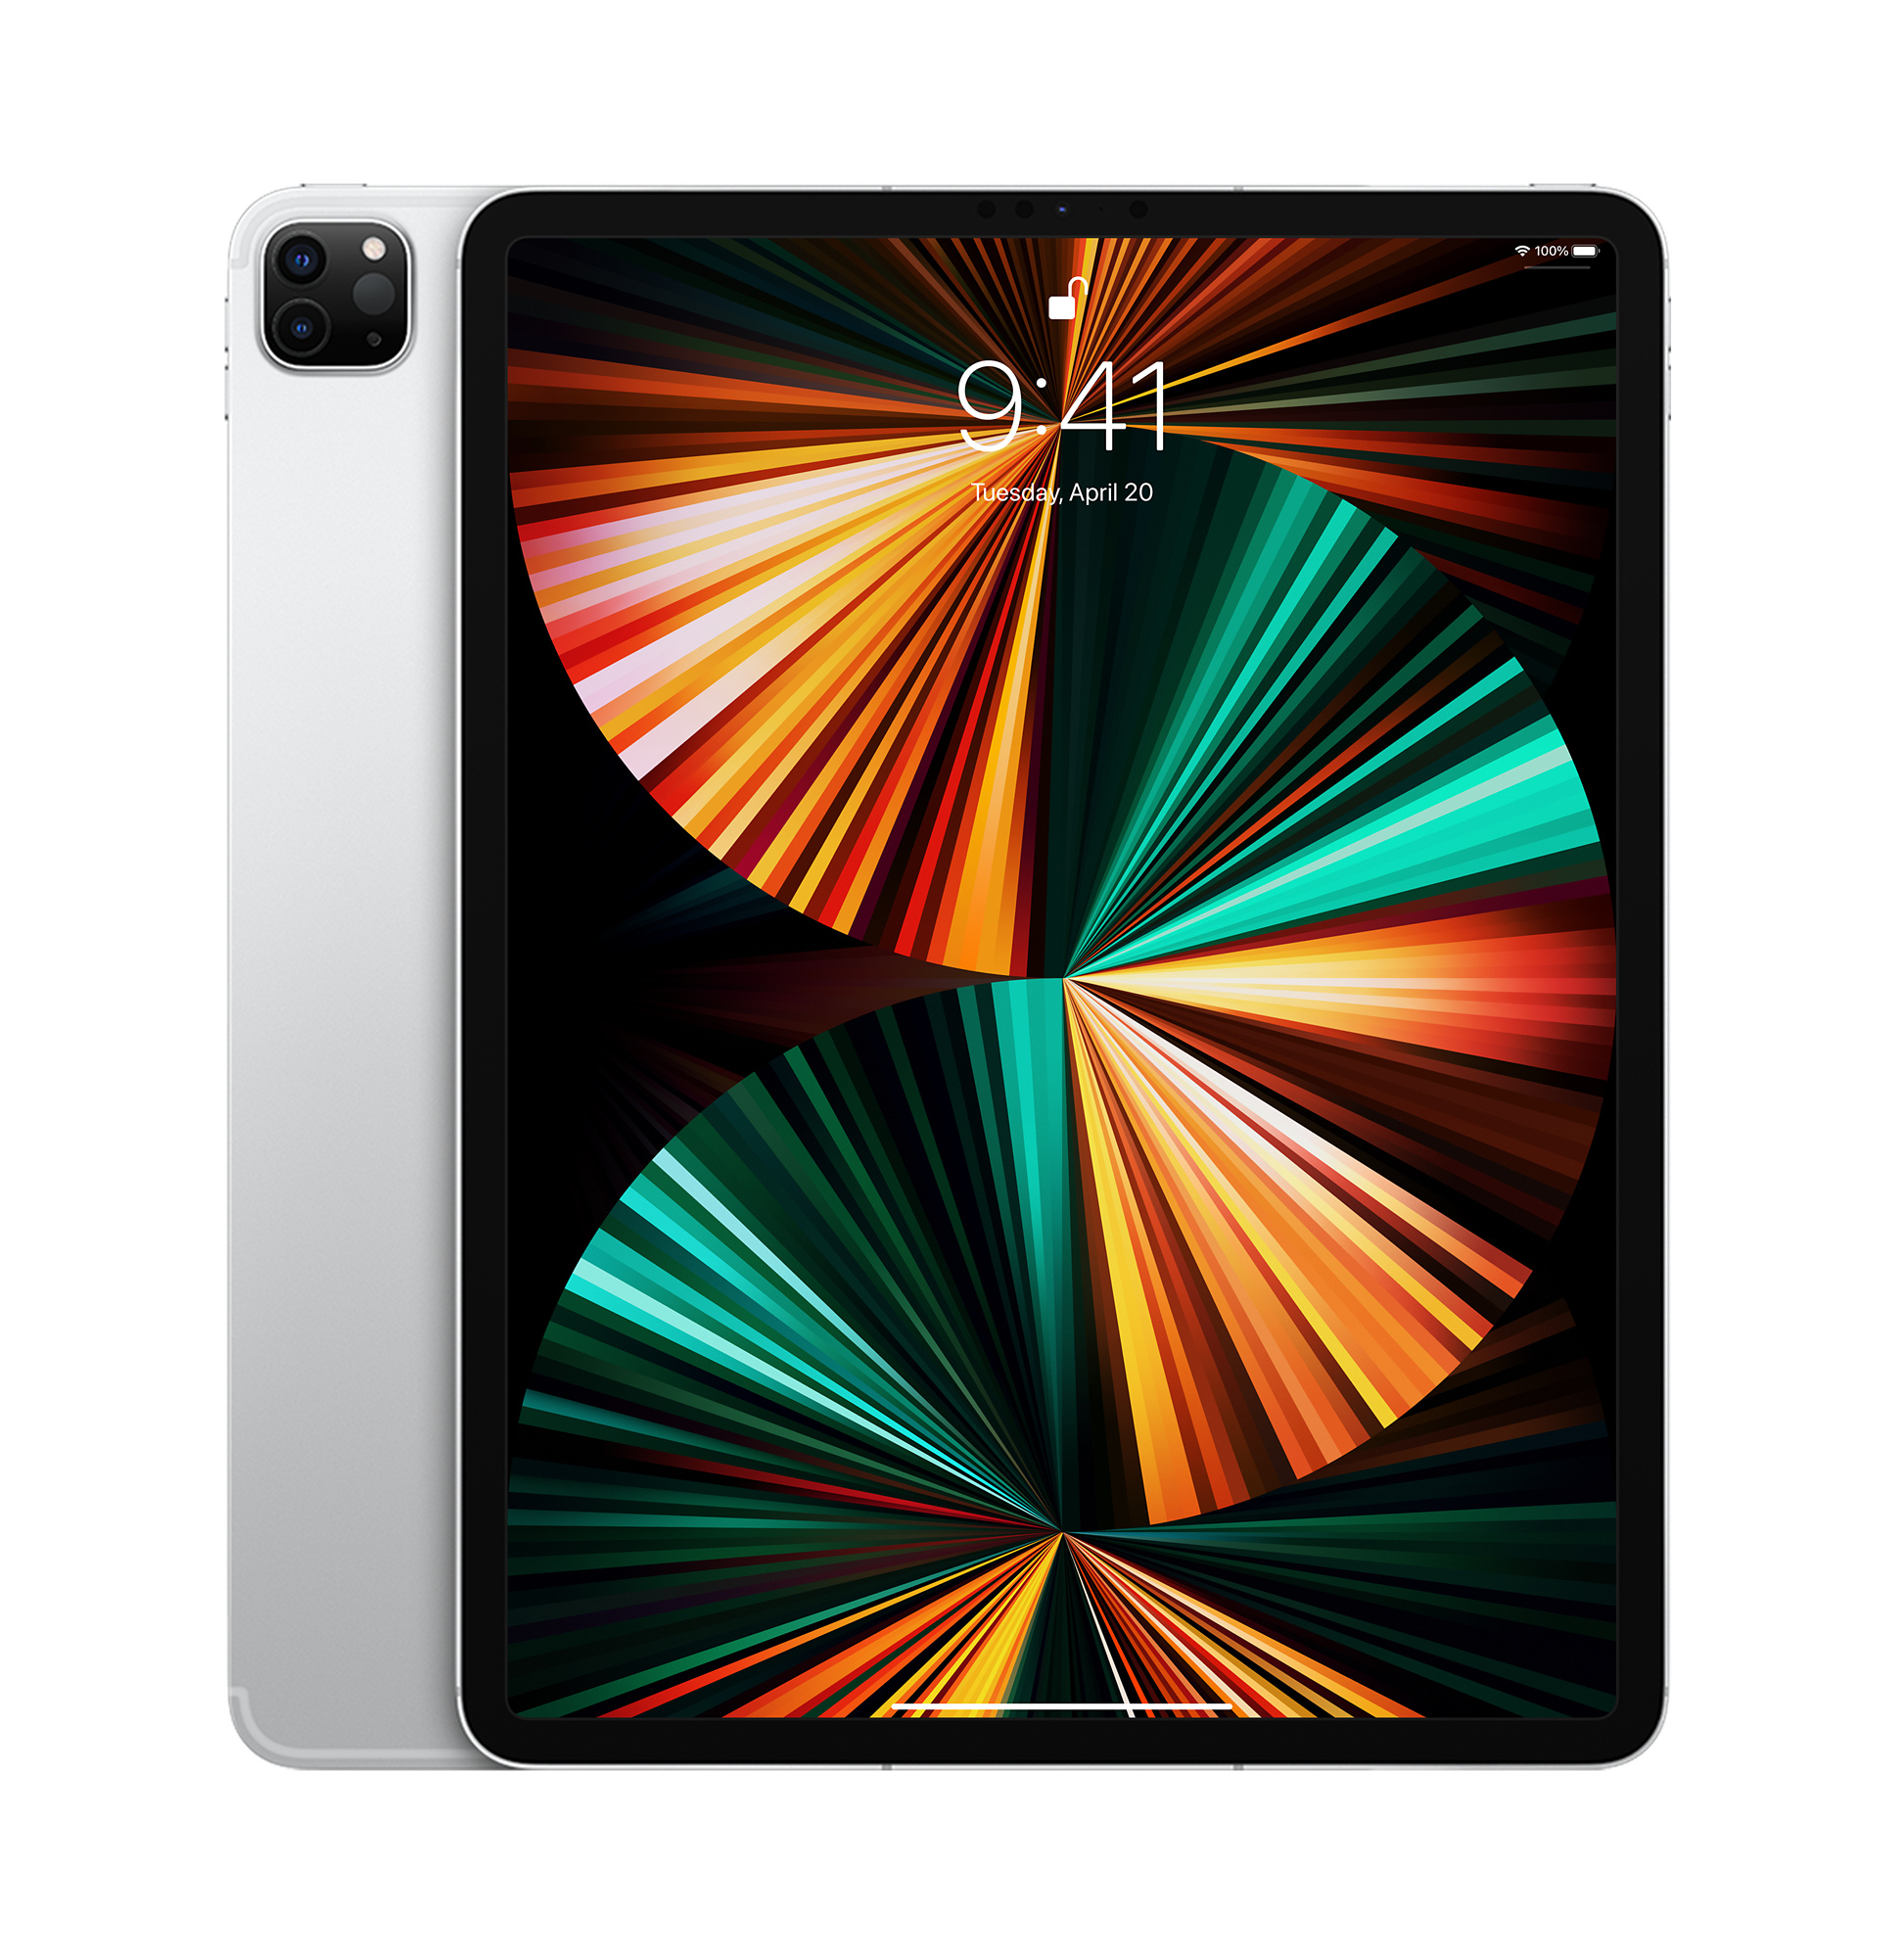 12.9-inch iPad Pro Wi-Fi + Cellular 256GB - Silver - Apple